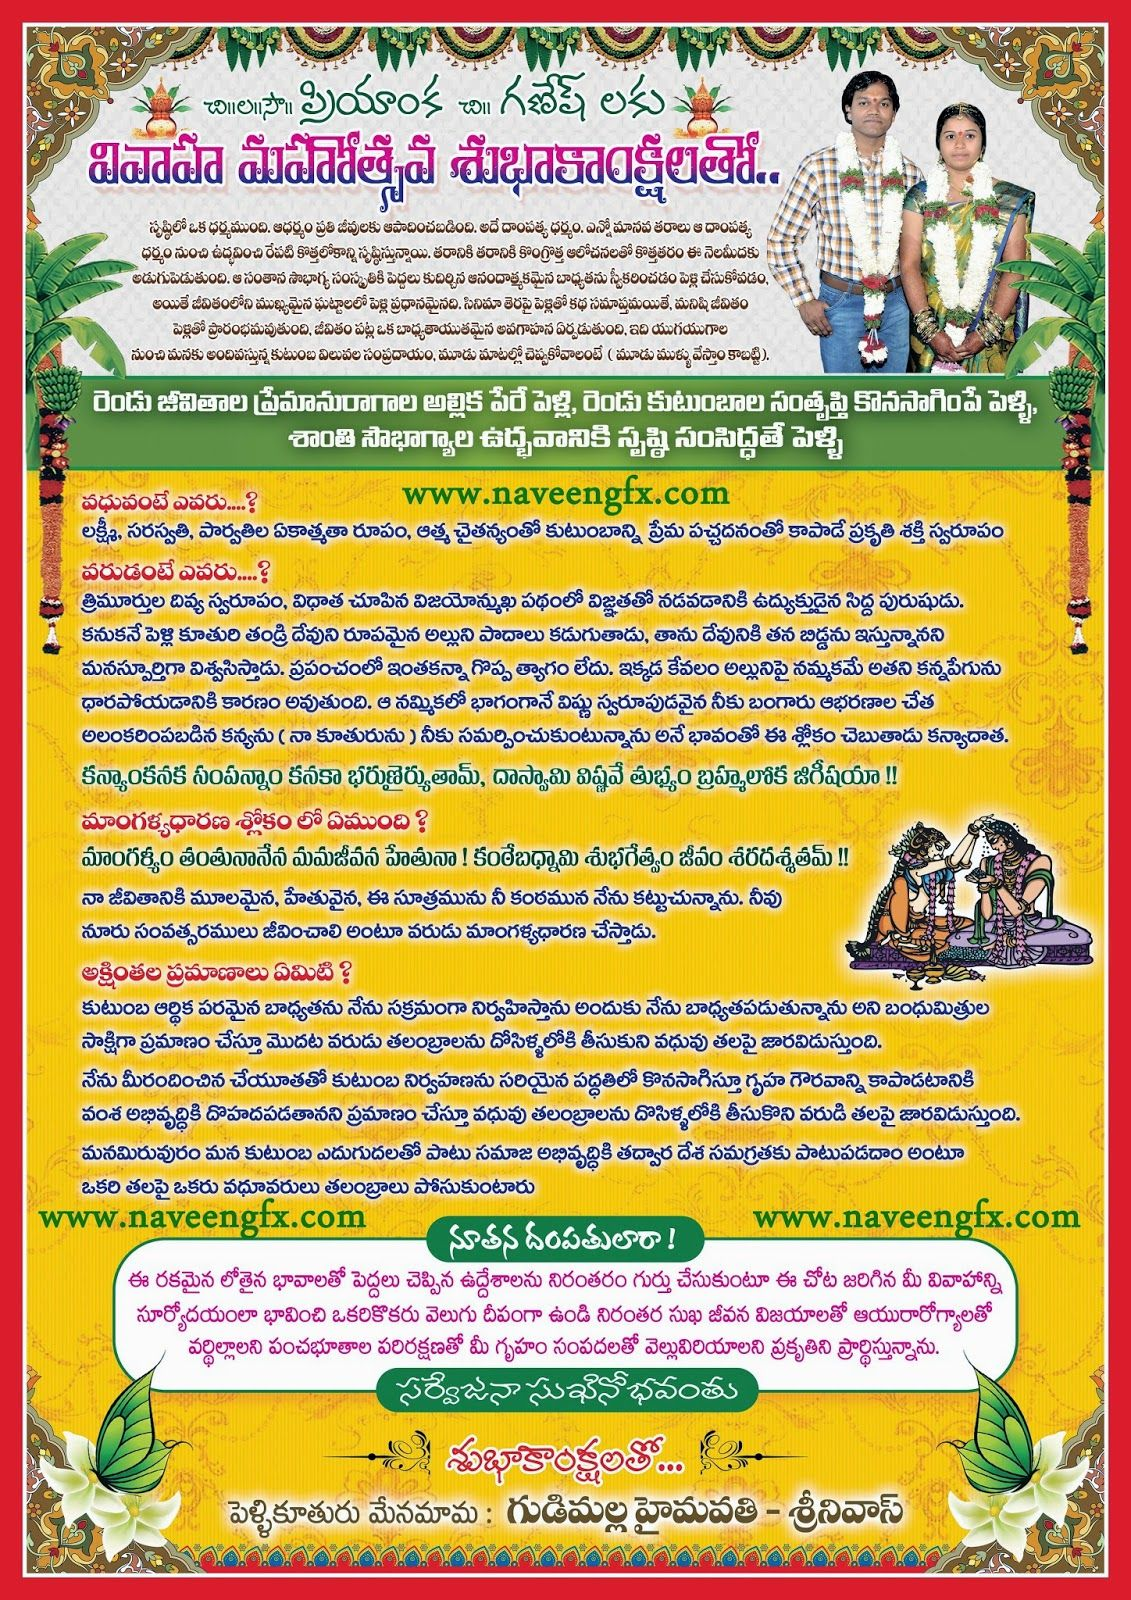 Naveengfx Com Description On Wedding In Telugu School Brochure